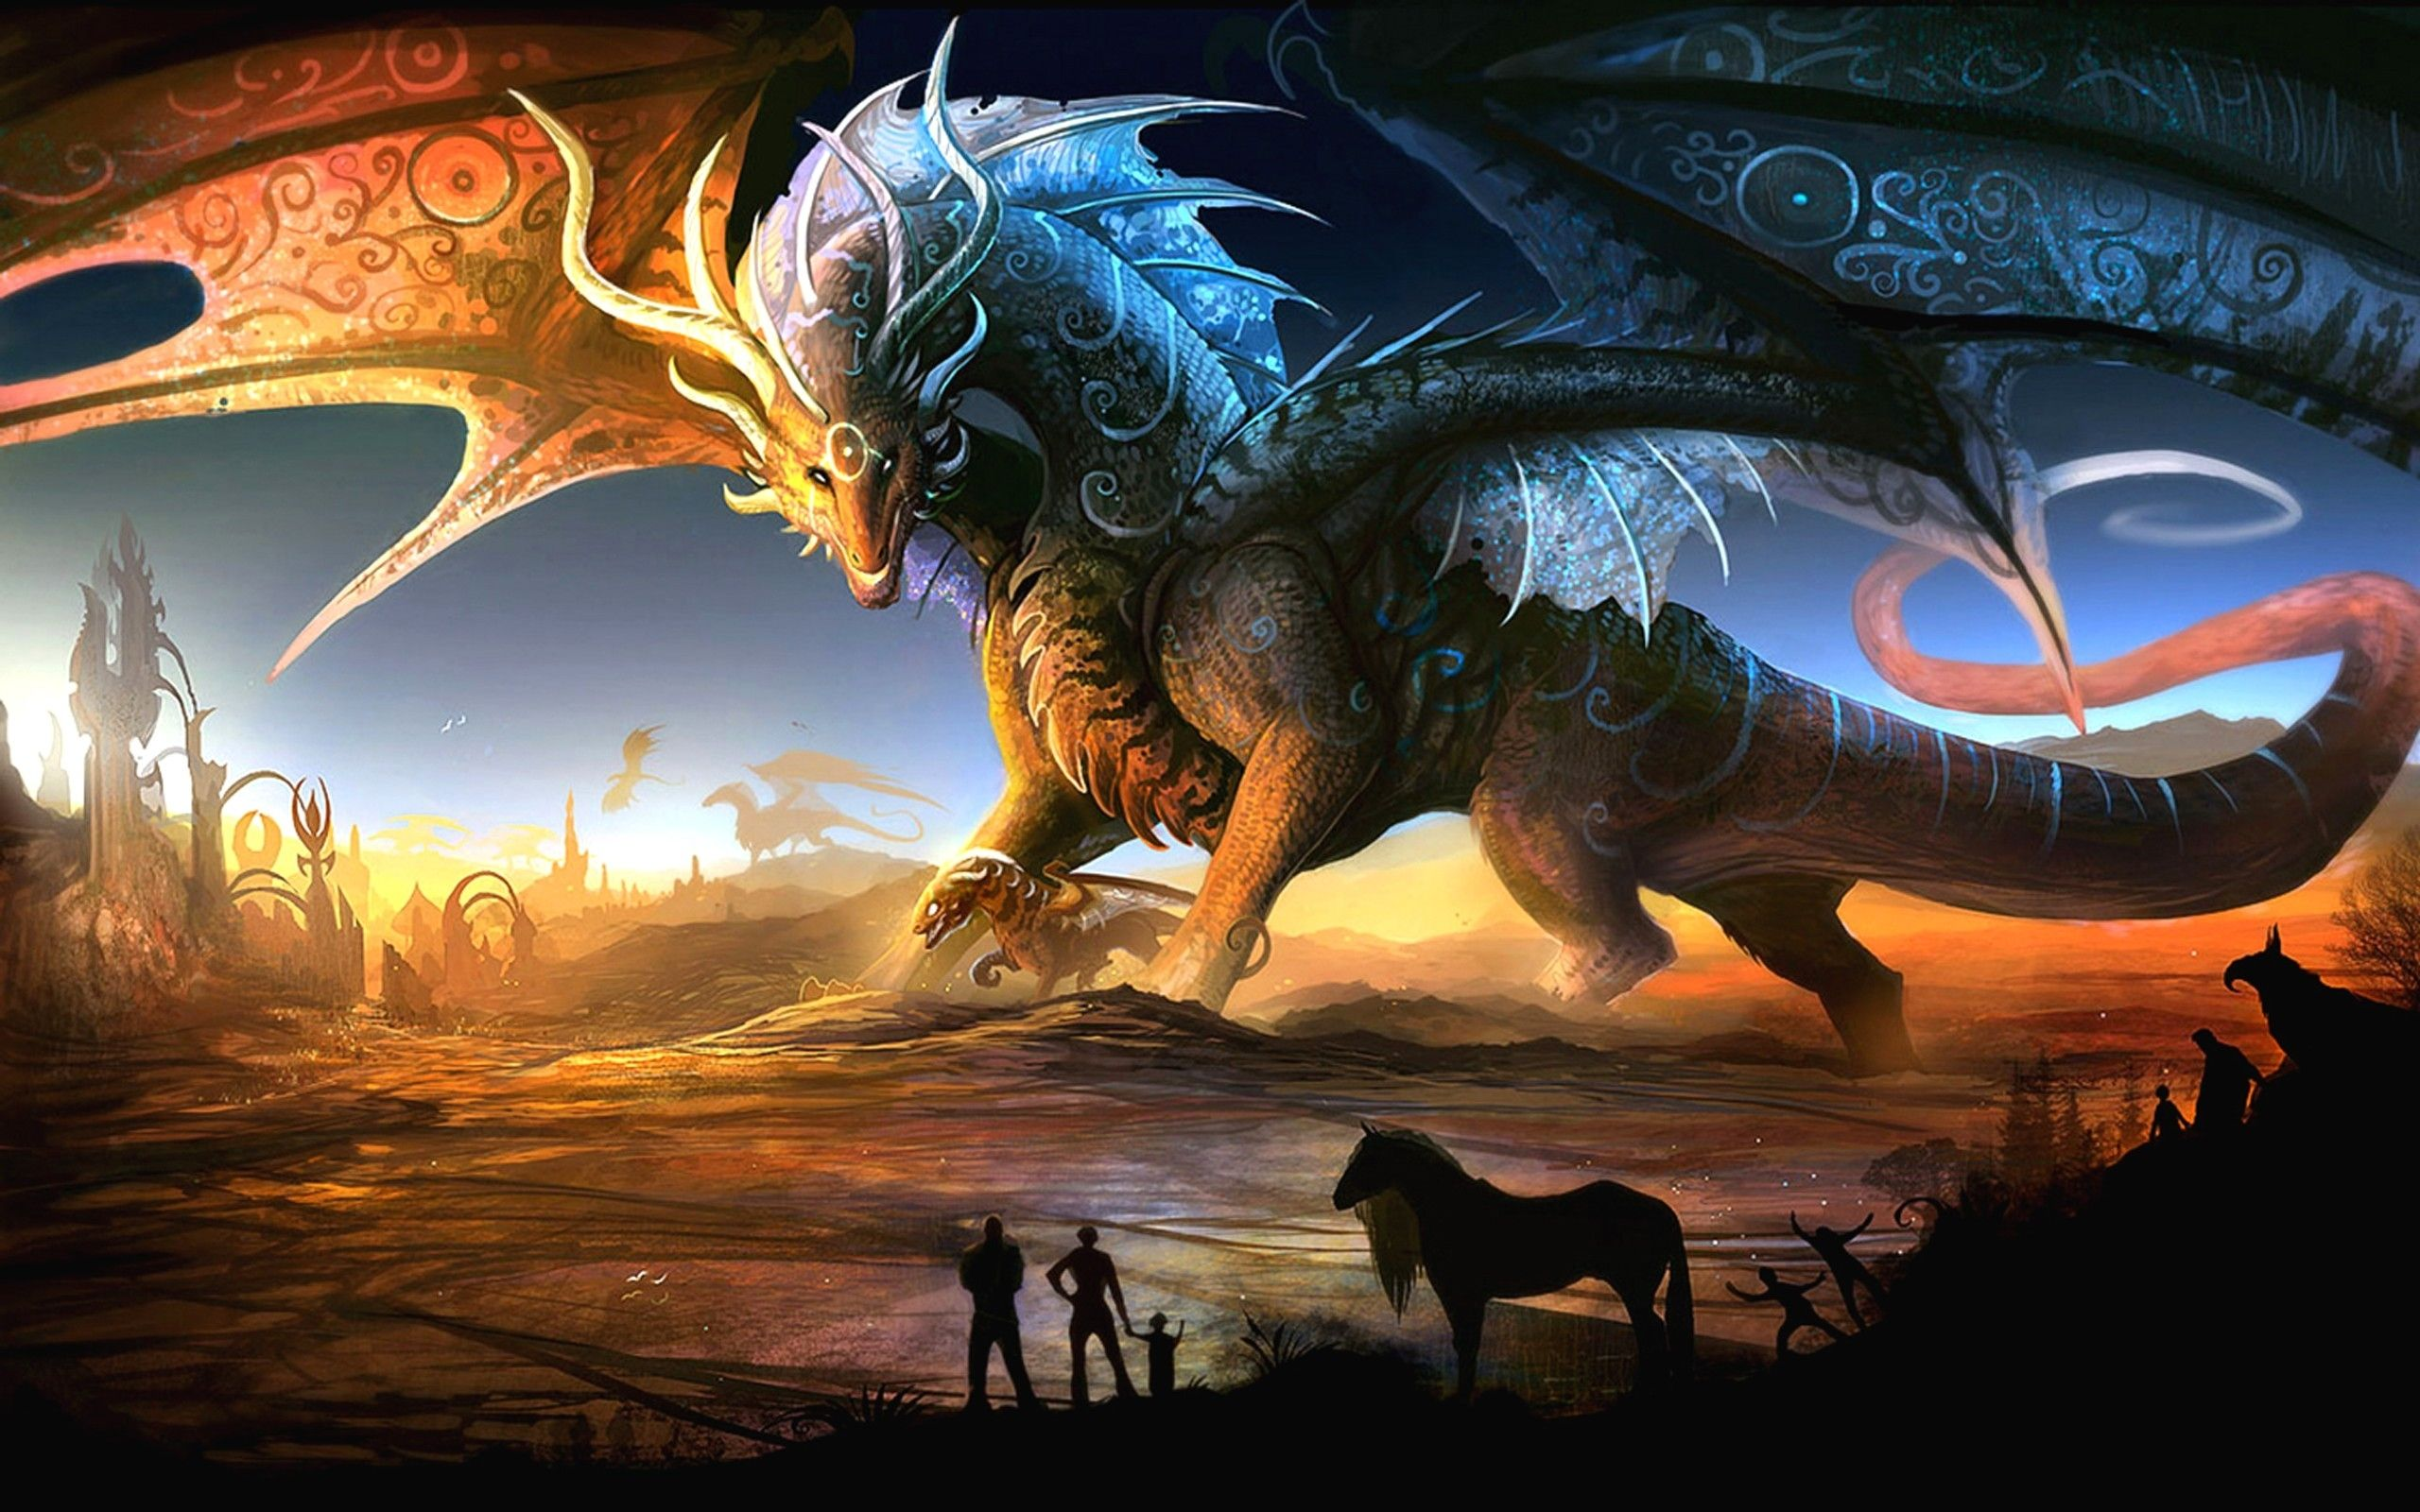 Dreamy Fantasy Giant Dragon HD Desktop Wallpaper, Instagram photo, Background Image - AmazingPict.com